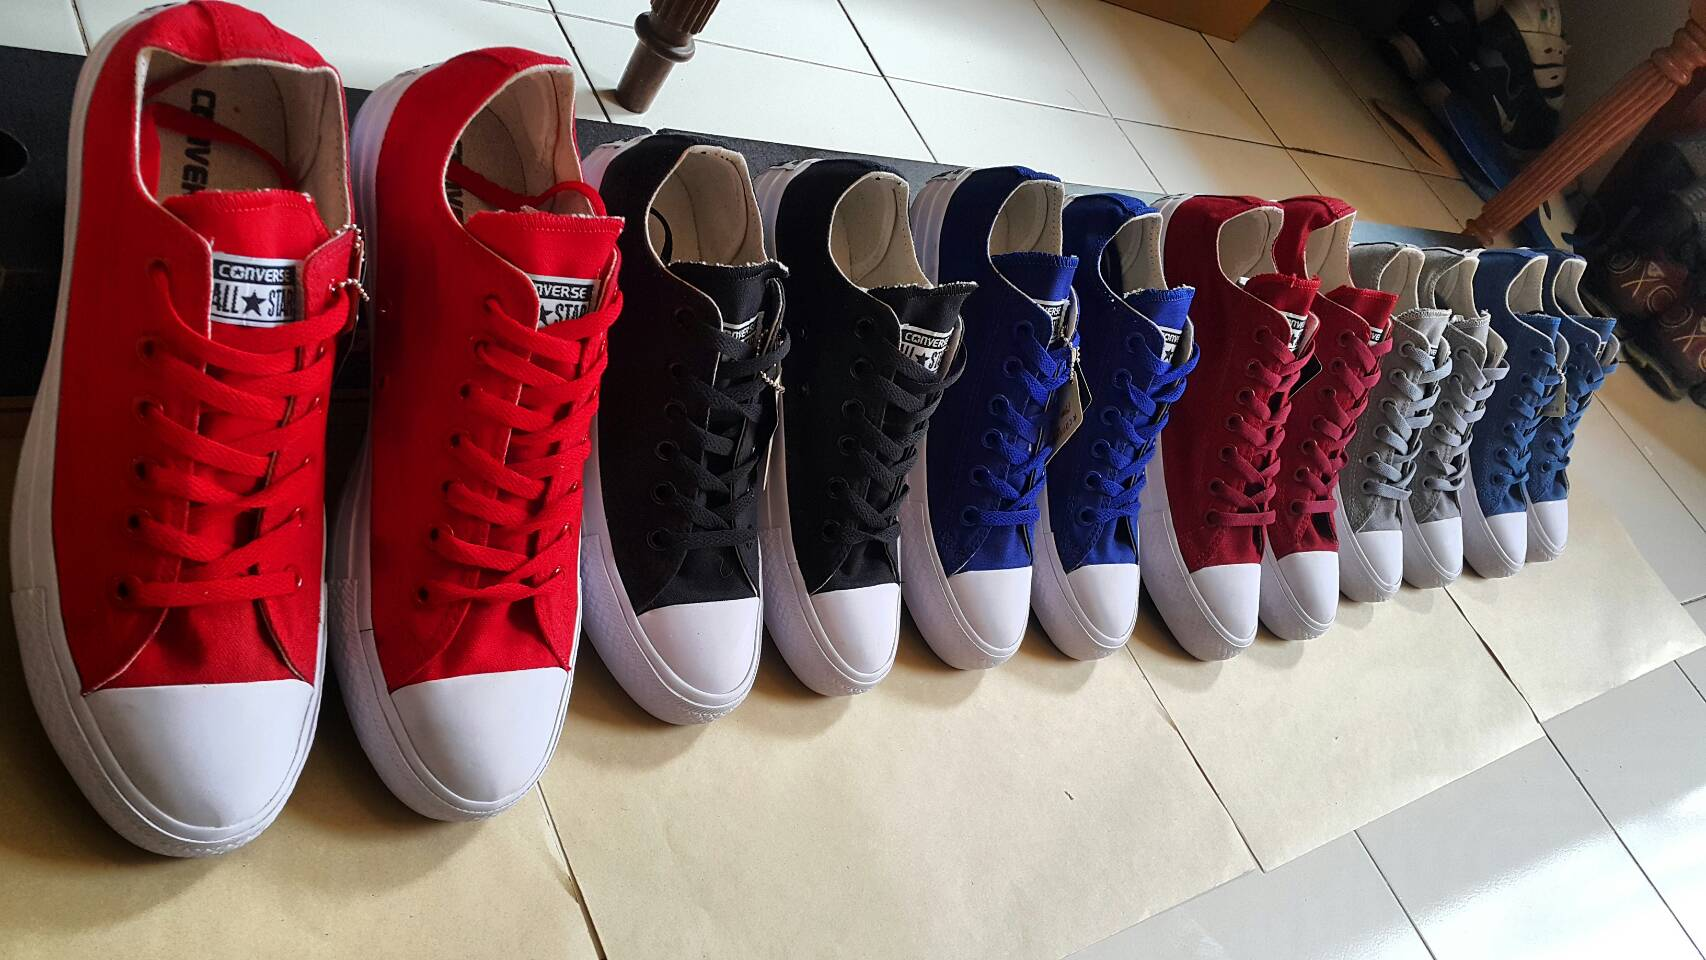 Jual Sepatu Converse All Stars II Grade Ori asli Pabrik - Enjoyshop96 ... 3eab86dad8